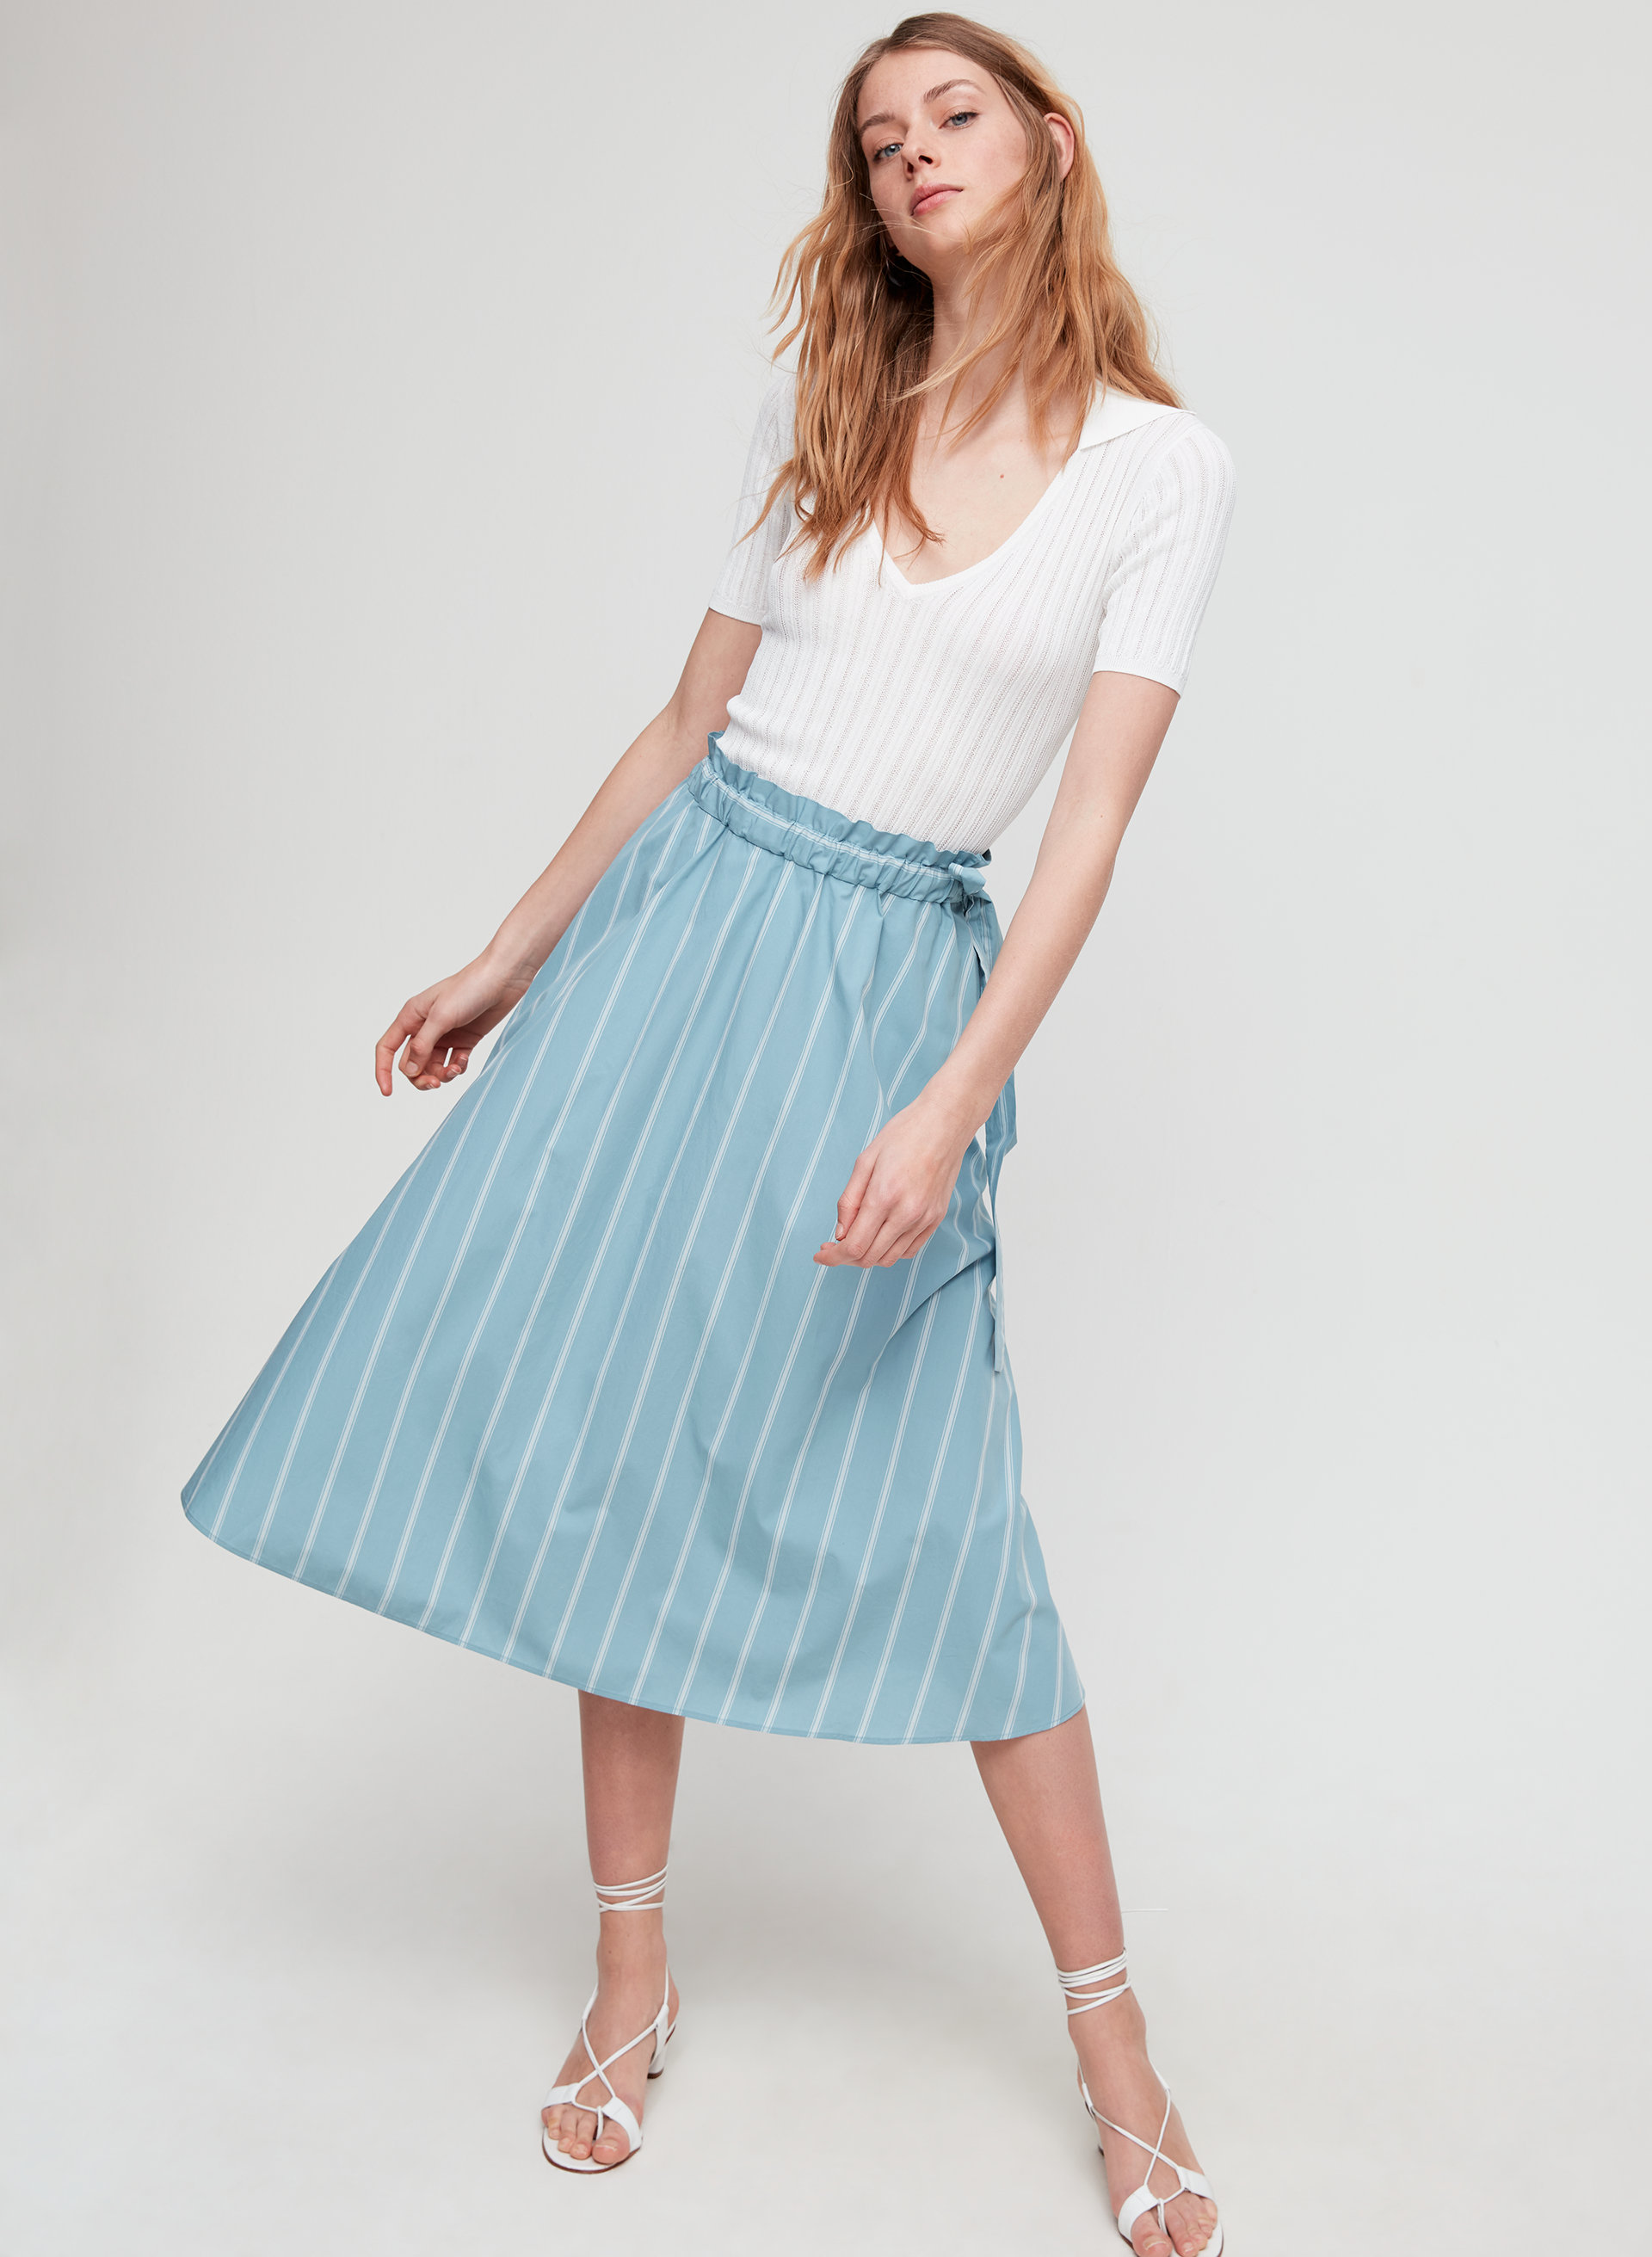 730319b96 chambly skirt Striped, A-line midi skirt